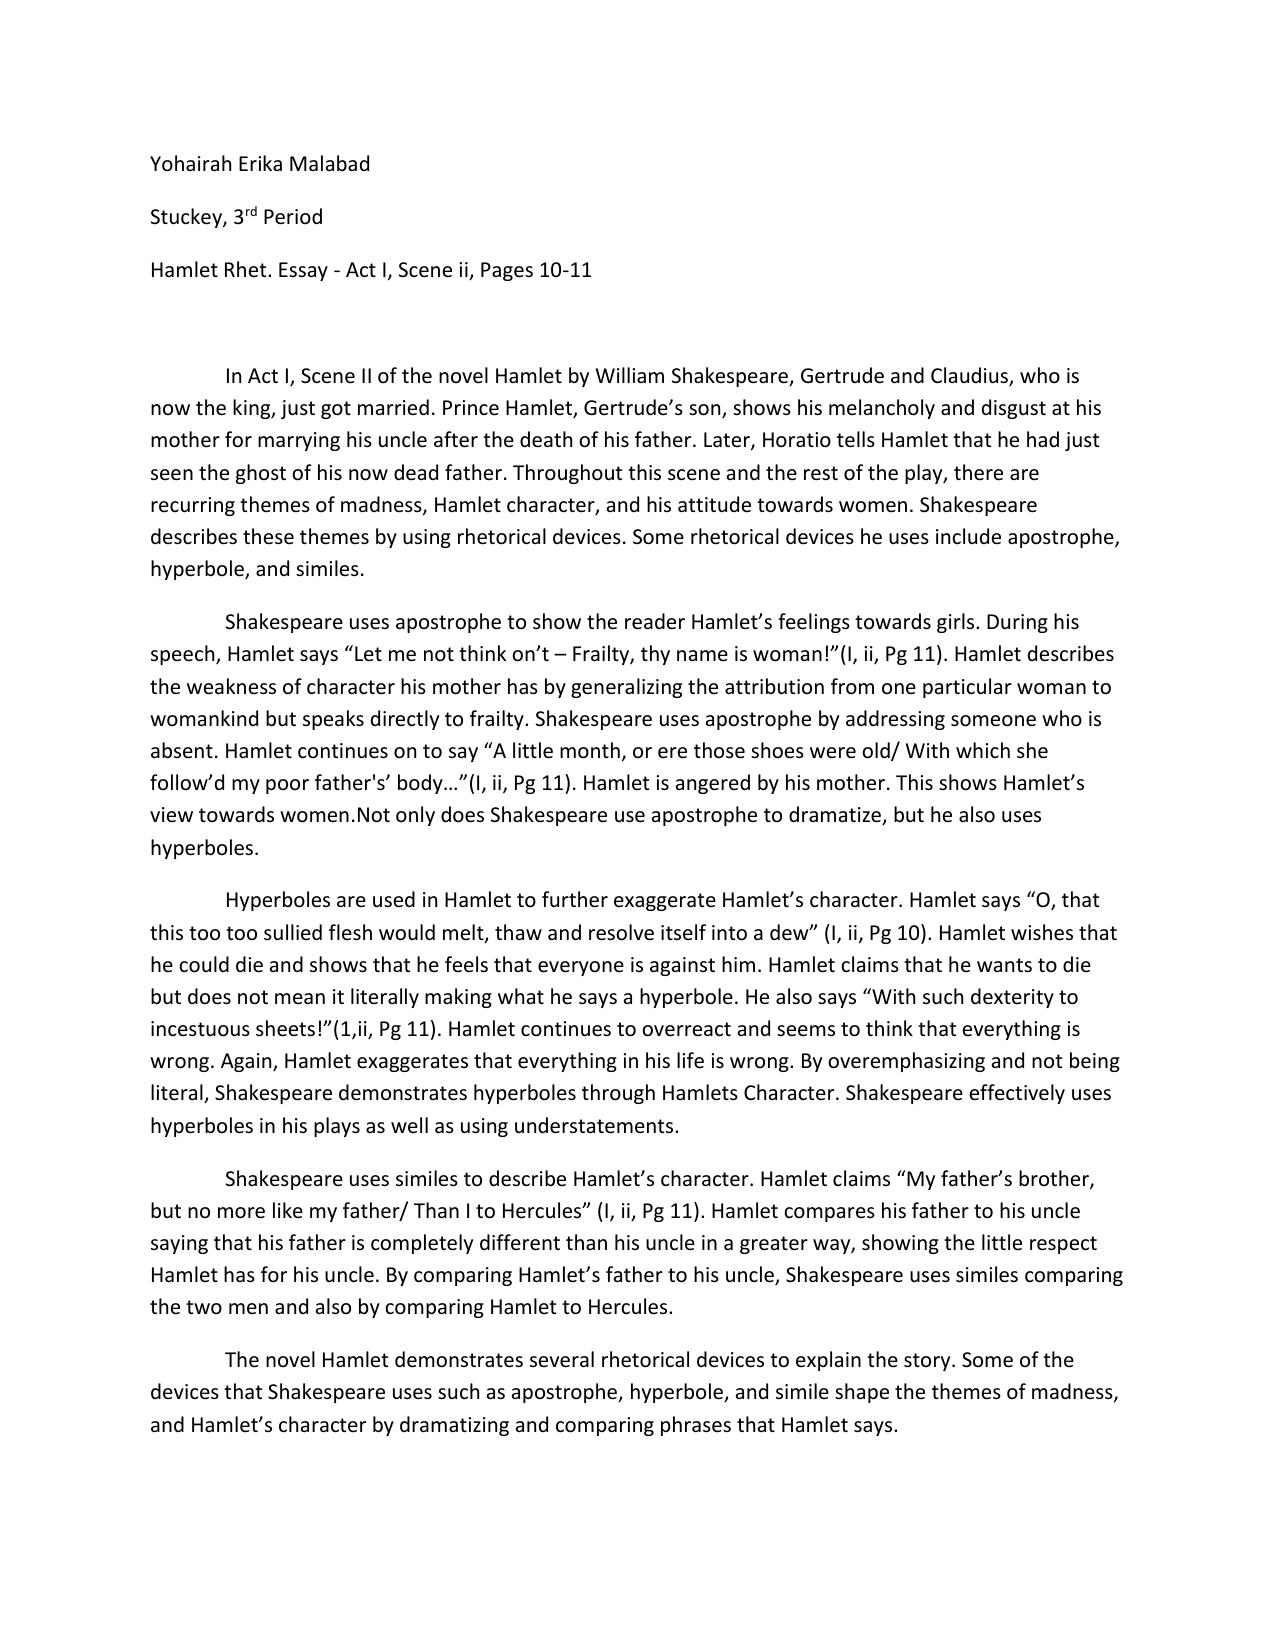 Do my popular rhetorical analysis essay on shakespeare sample essay question for soc 100